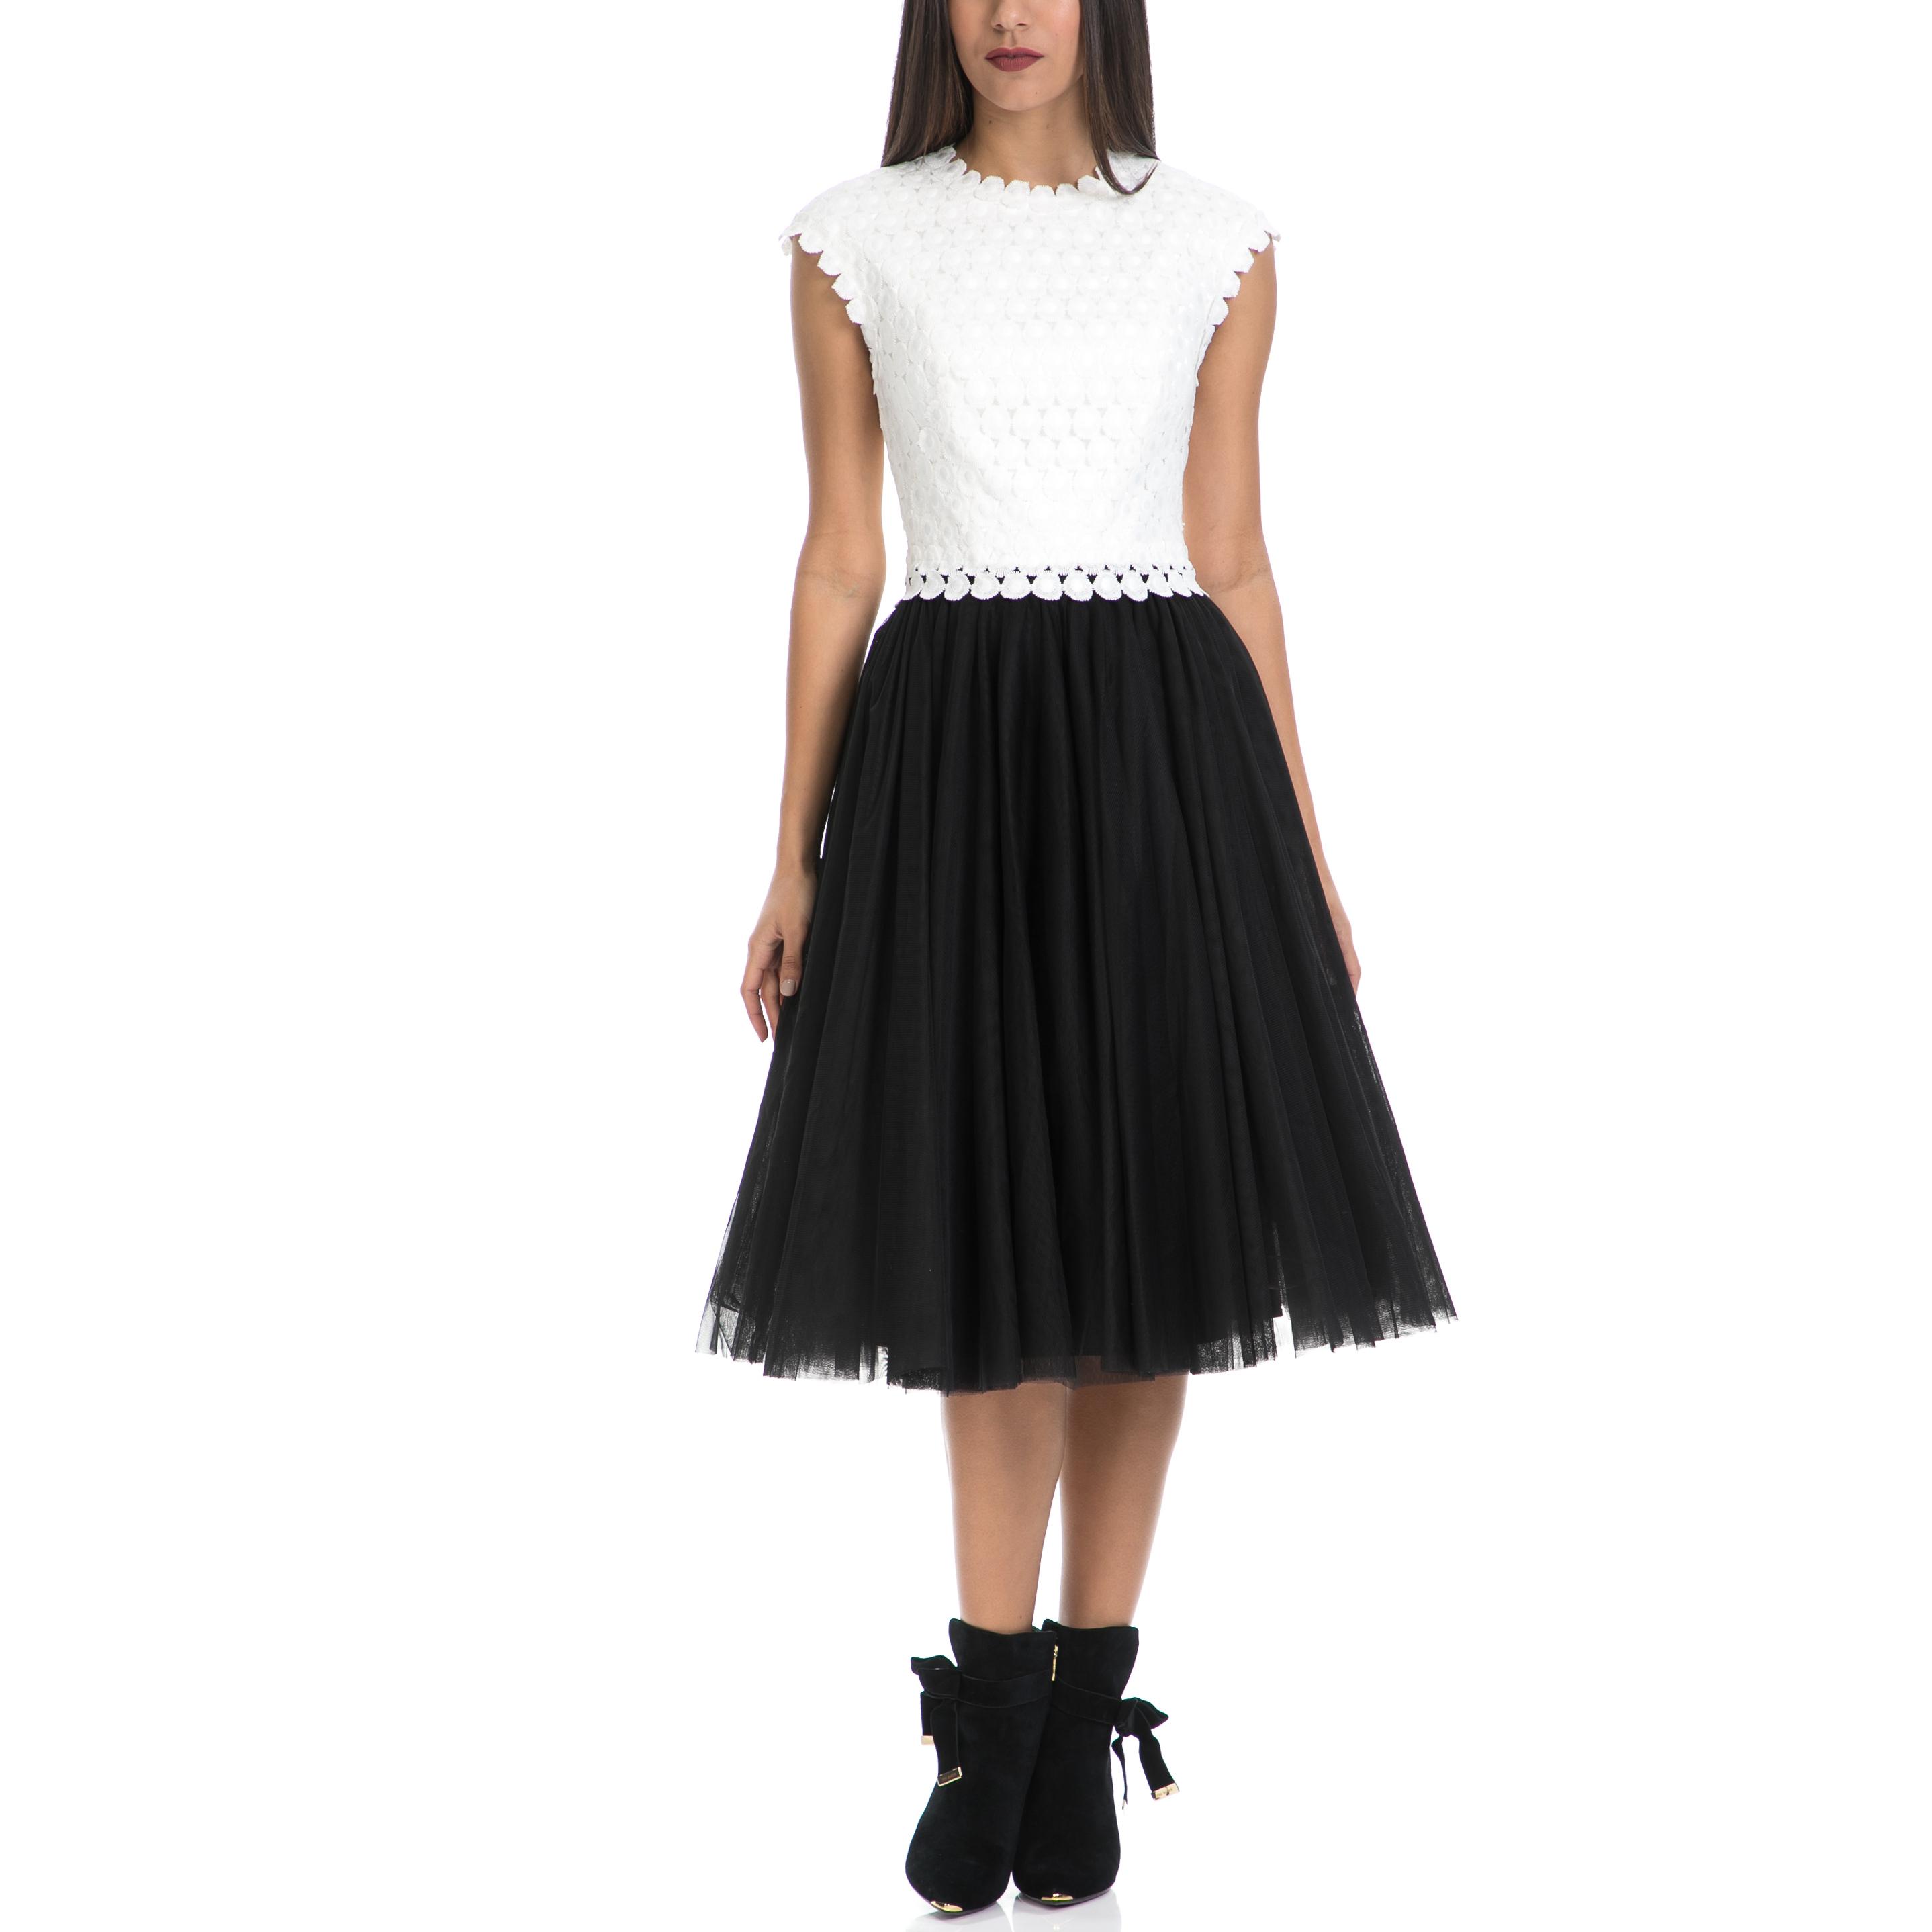 TED BAKER - Γυναικείο φόρεμα LAECI TED BAKER λευκό-μαύρο γυναικεία ρούχα φορέματα μέχρι το γόνατο